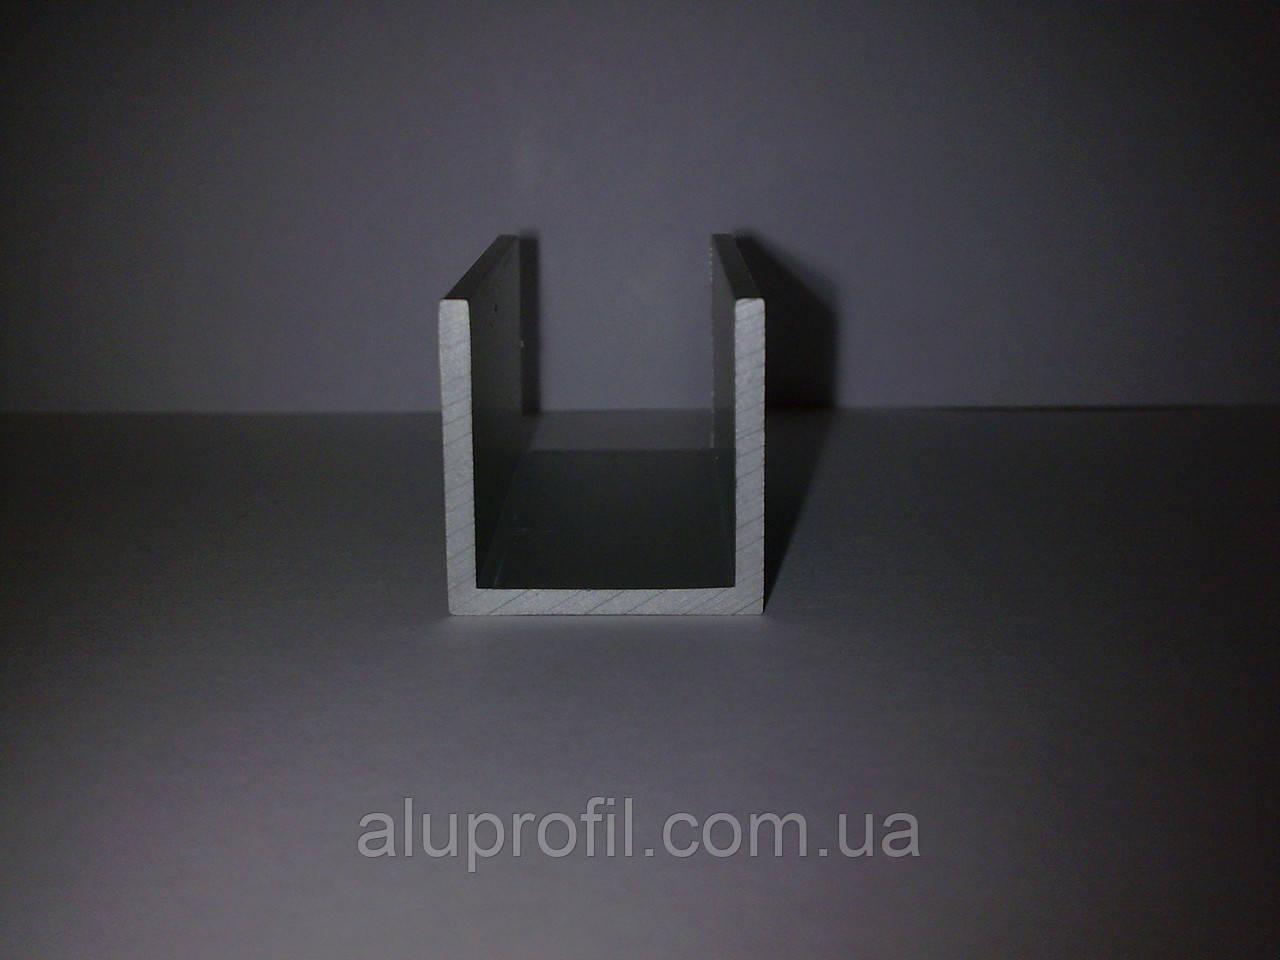 Алюминиевый профиль — швеллер размером 25х25х2 Б/П